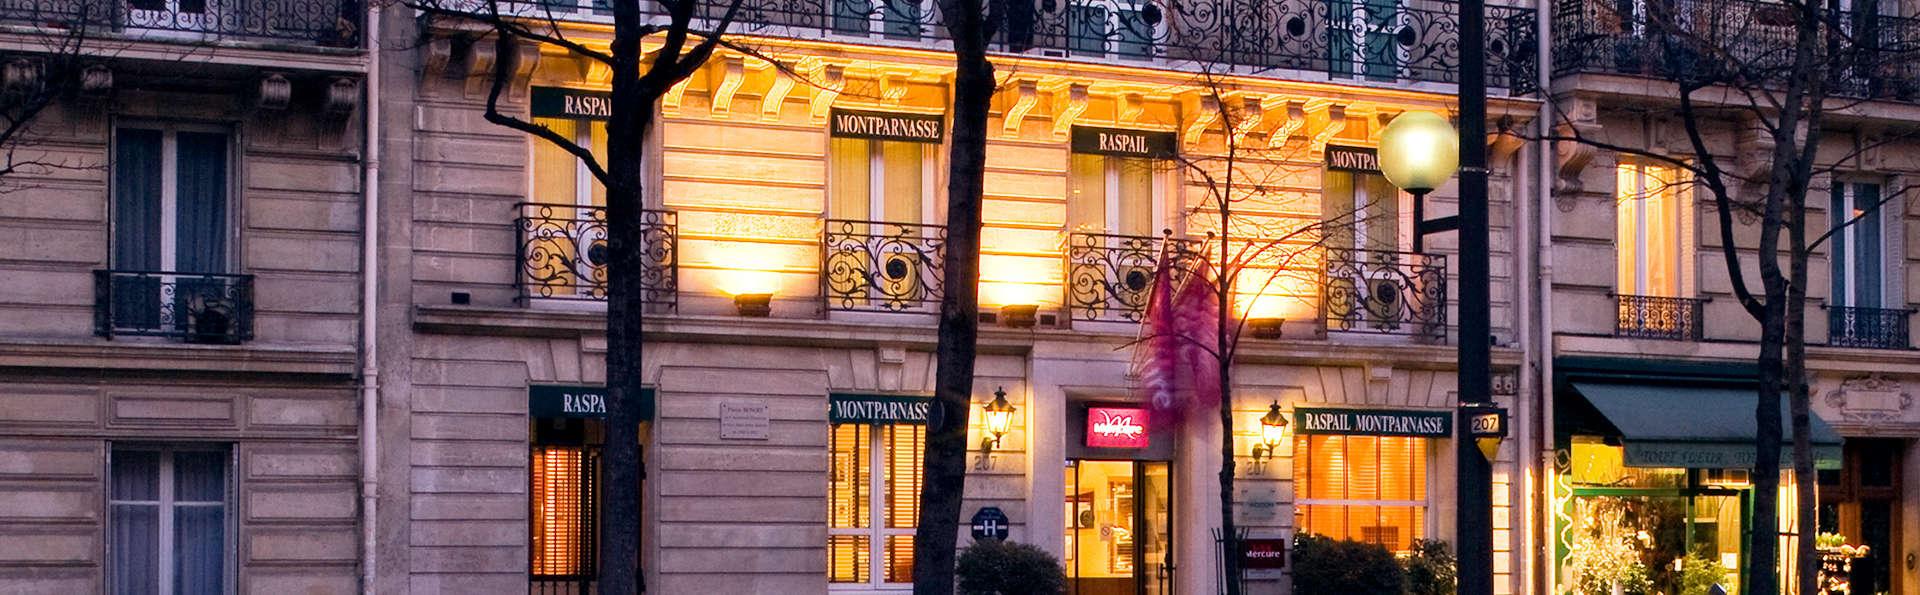 Mercure Paris Montparnasse Raspail 4